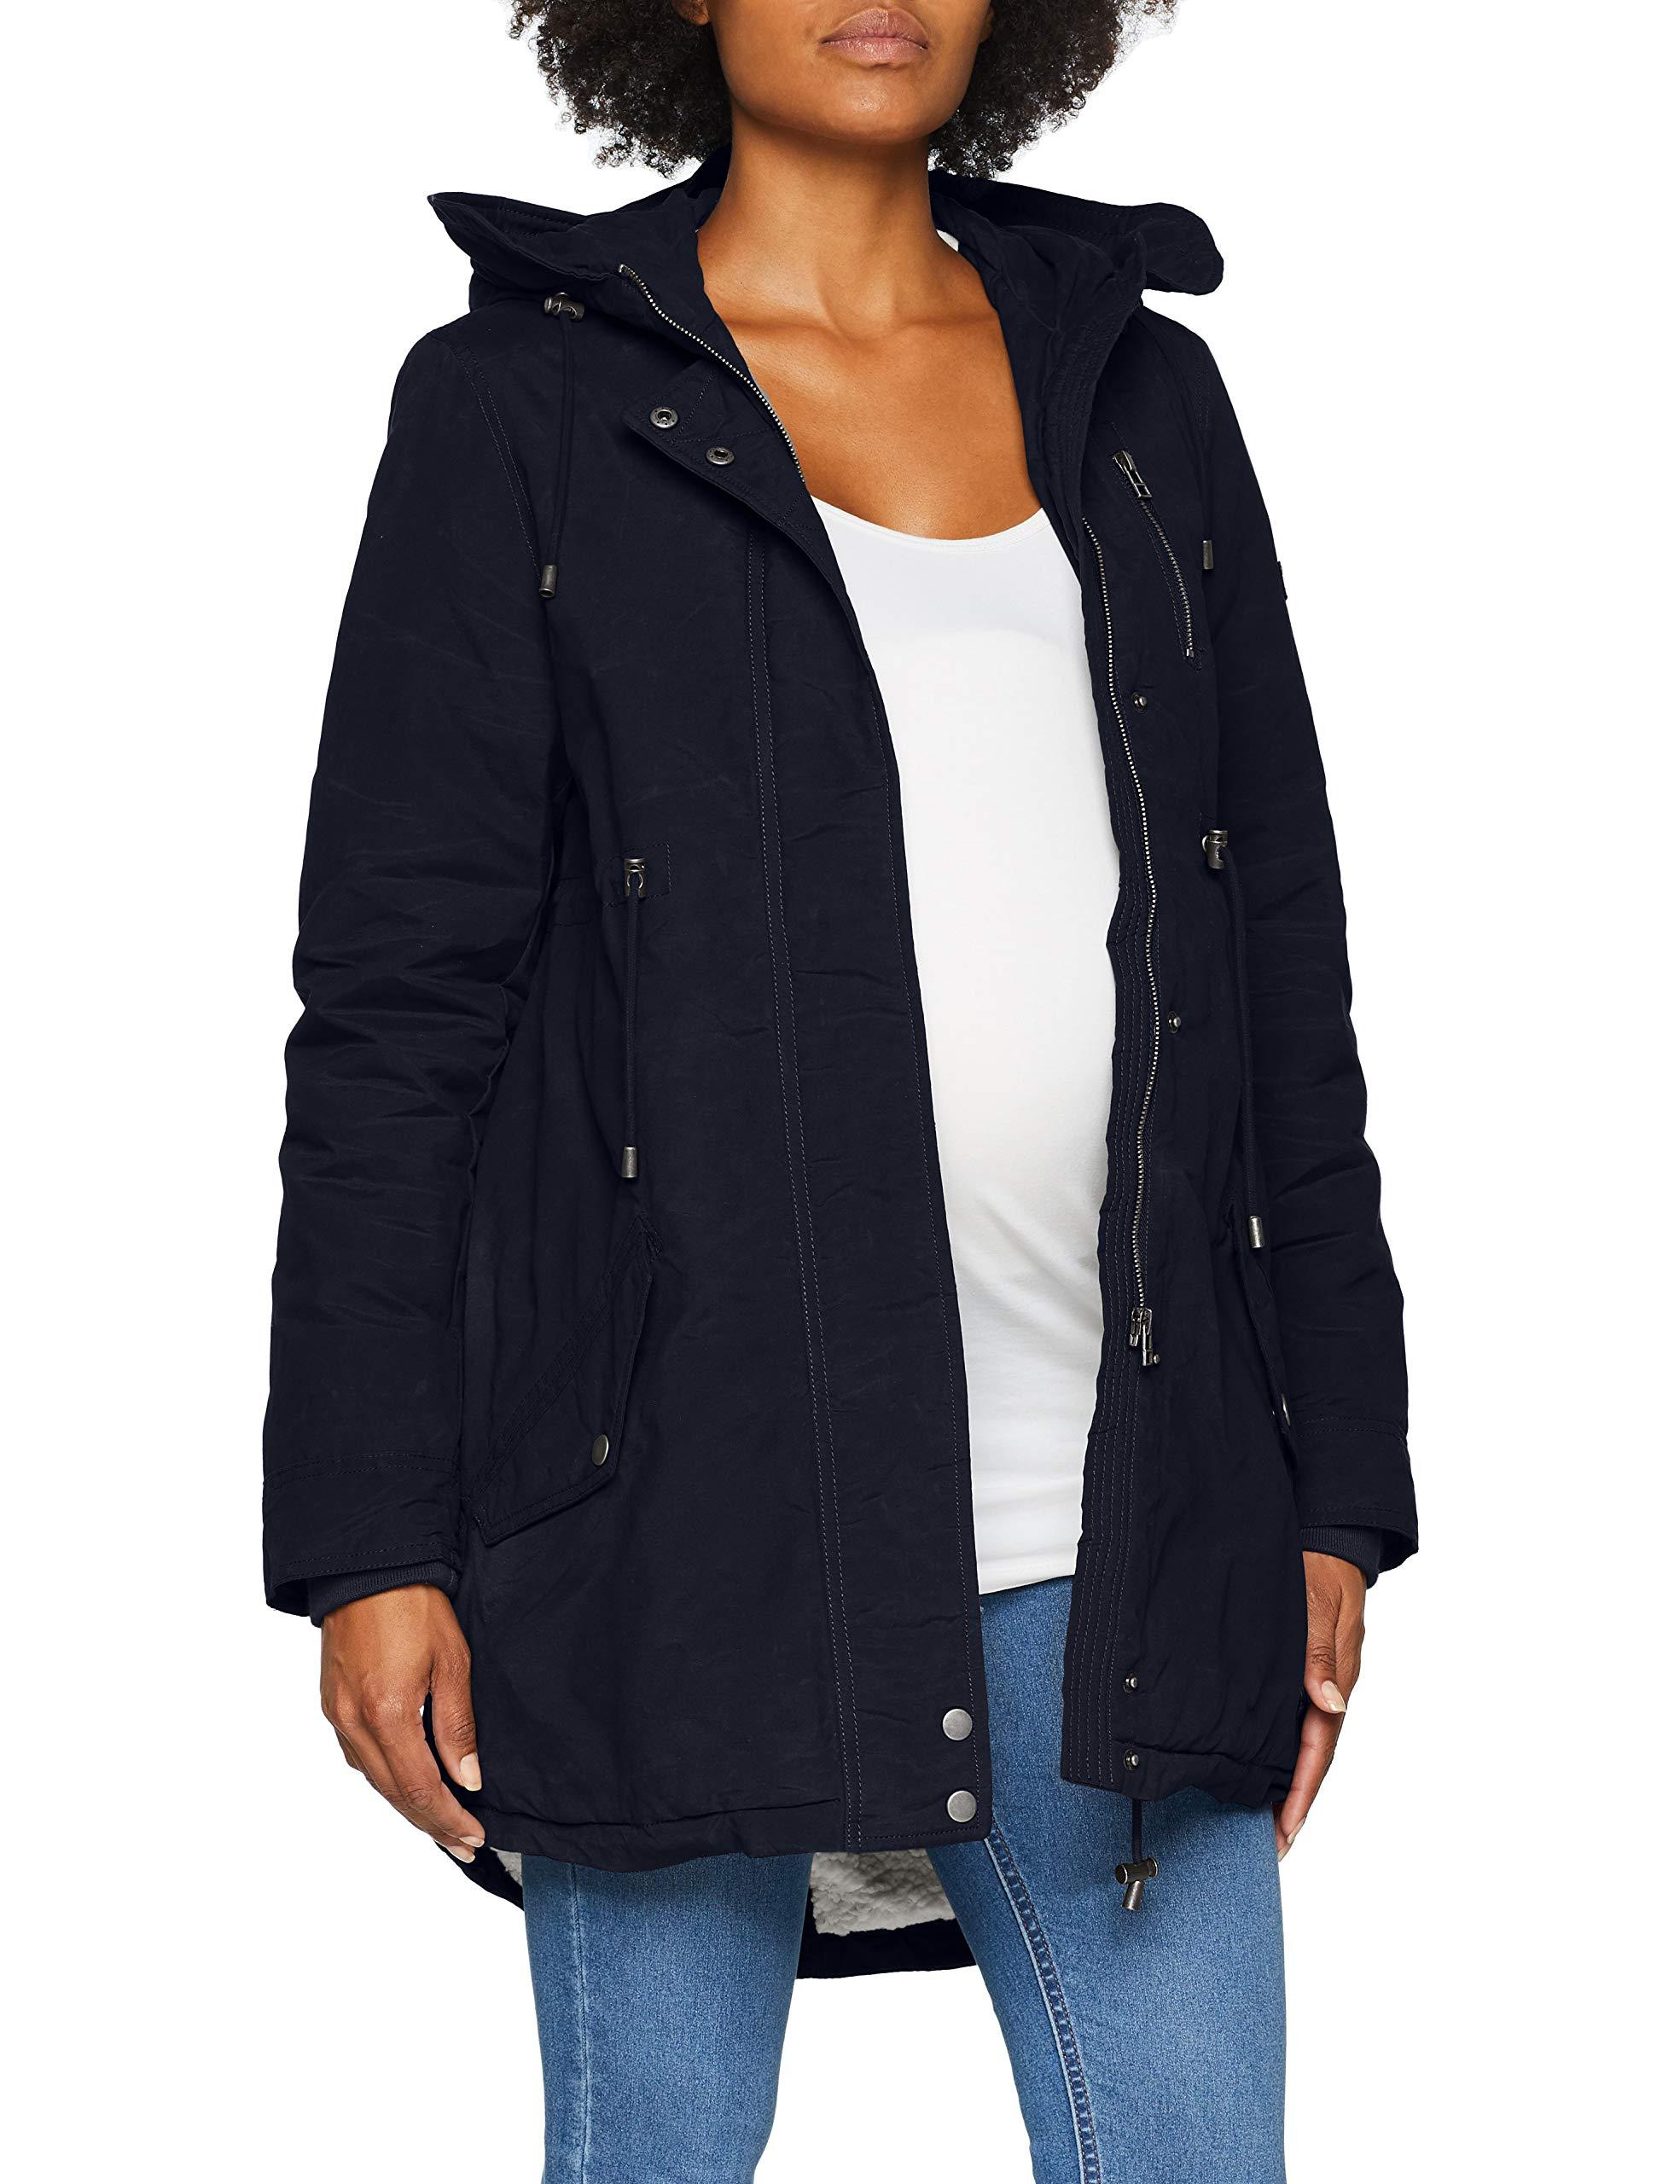 Parka Maternity Esprit Blue De MaternitéBleunight Femme 48642 Veste 6gvYbyIf7